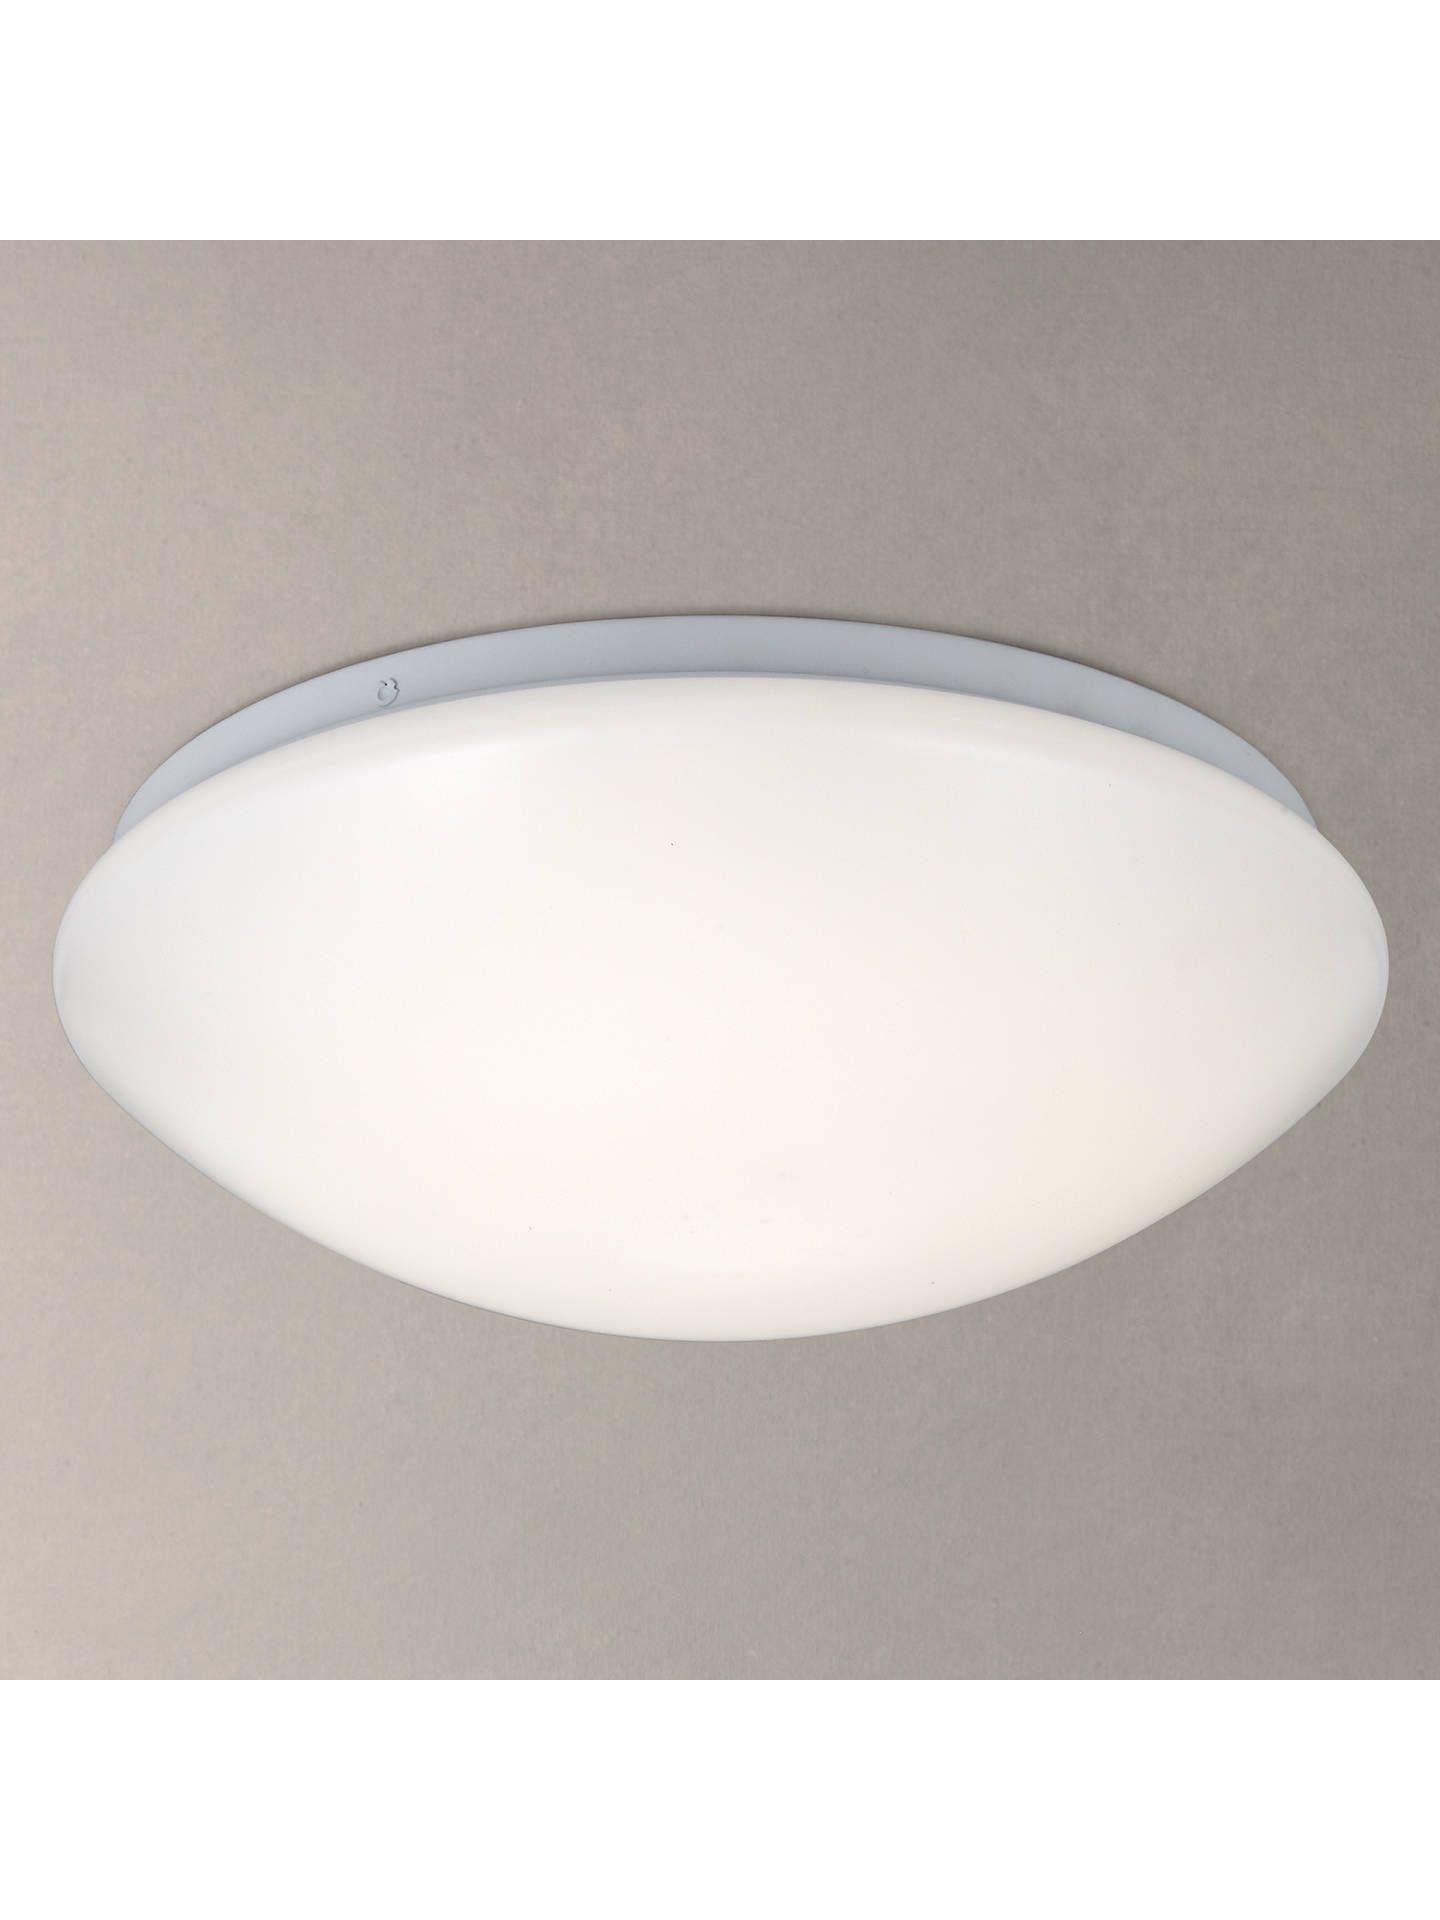 John Lewis Partners Saint Led Flush Bathroom Light Opal